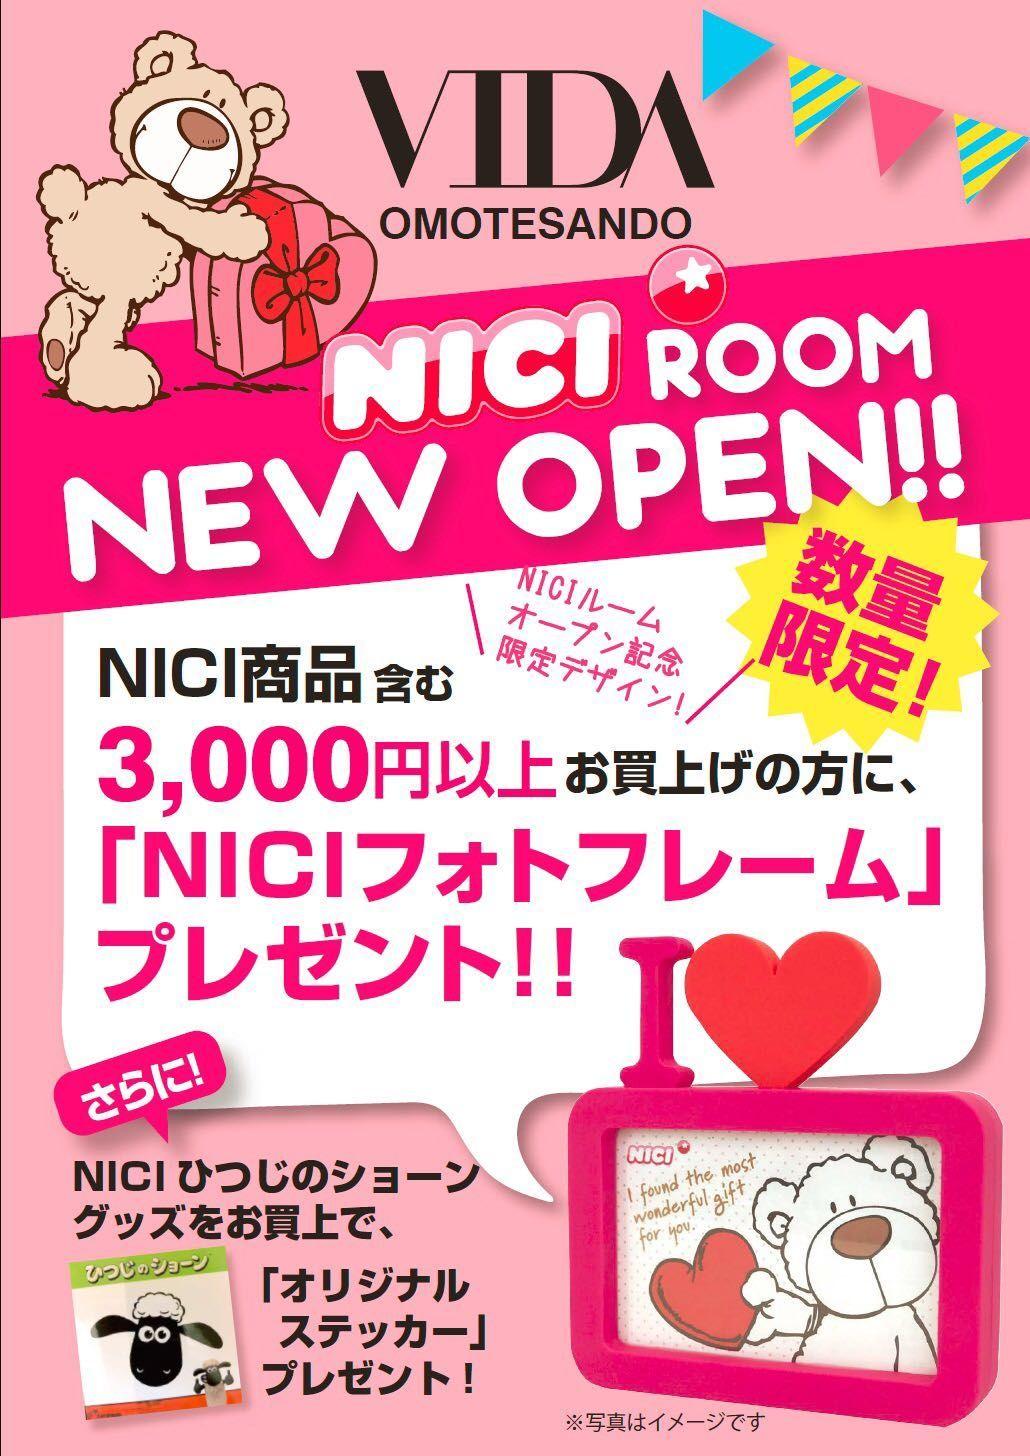 「☆★NICI ROOM NEW OPEN!!★☆」の写真